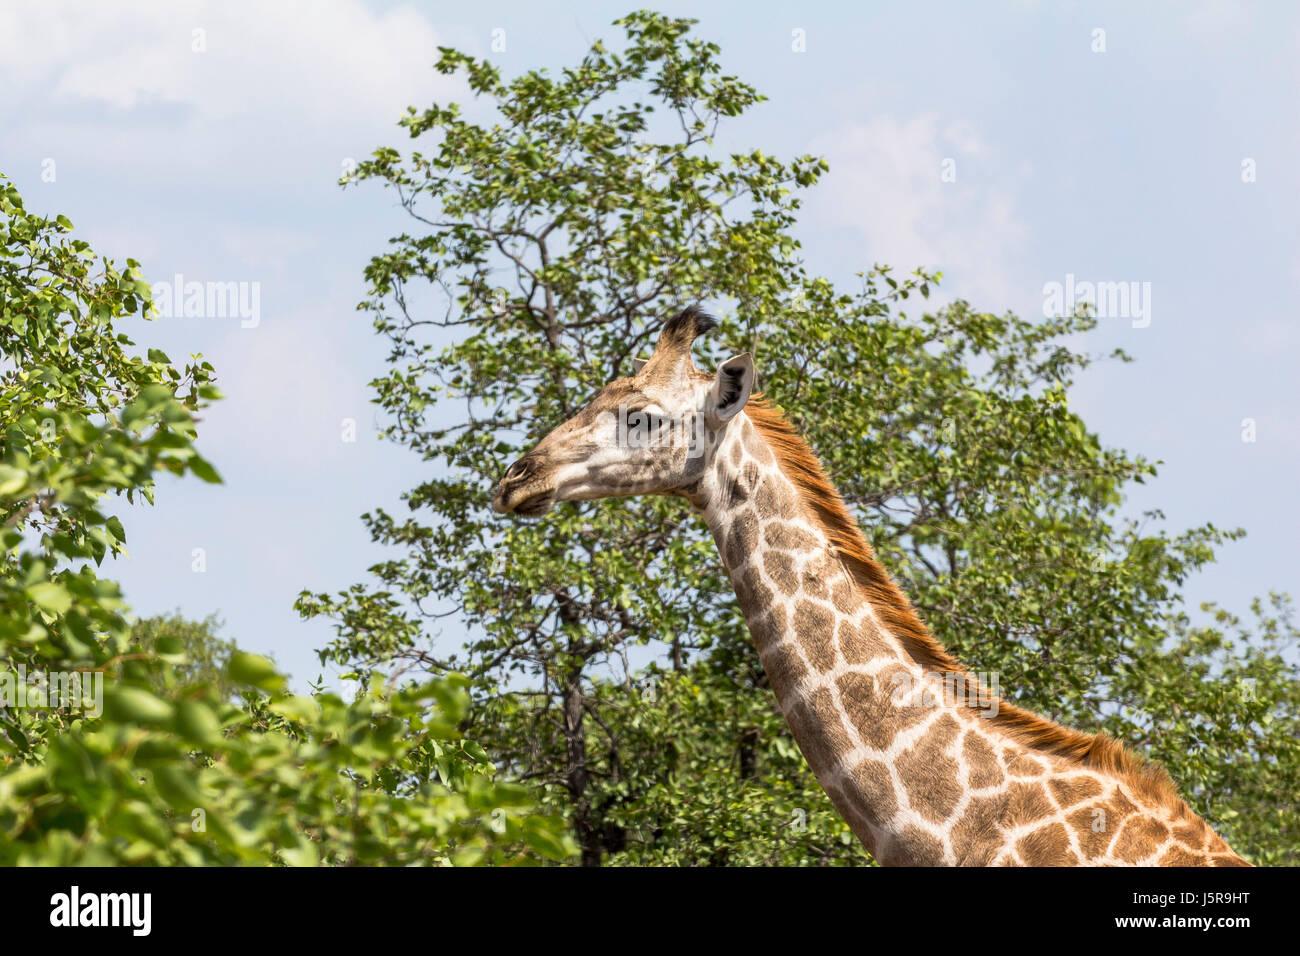 Giraffe standing inside Kruger Nationalpark in South Africa - Stock Image